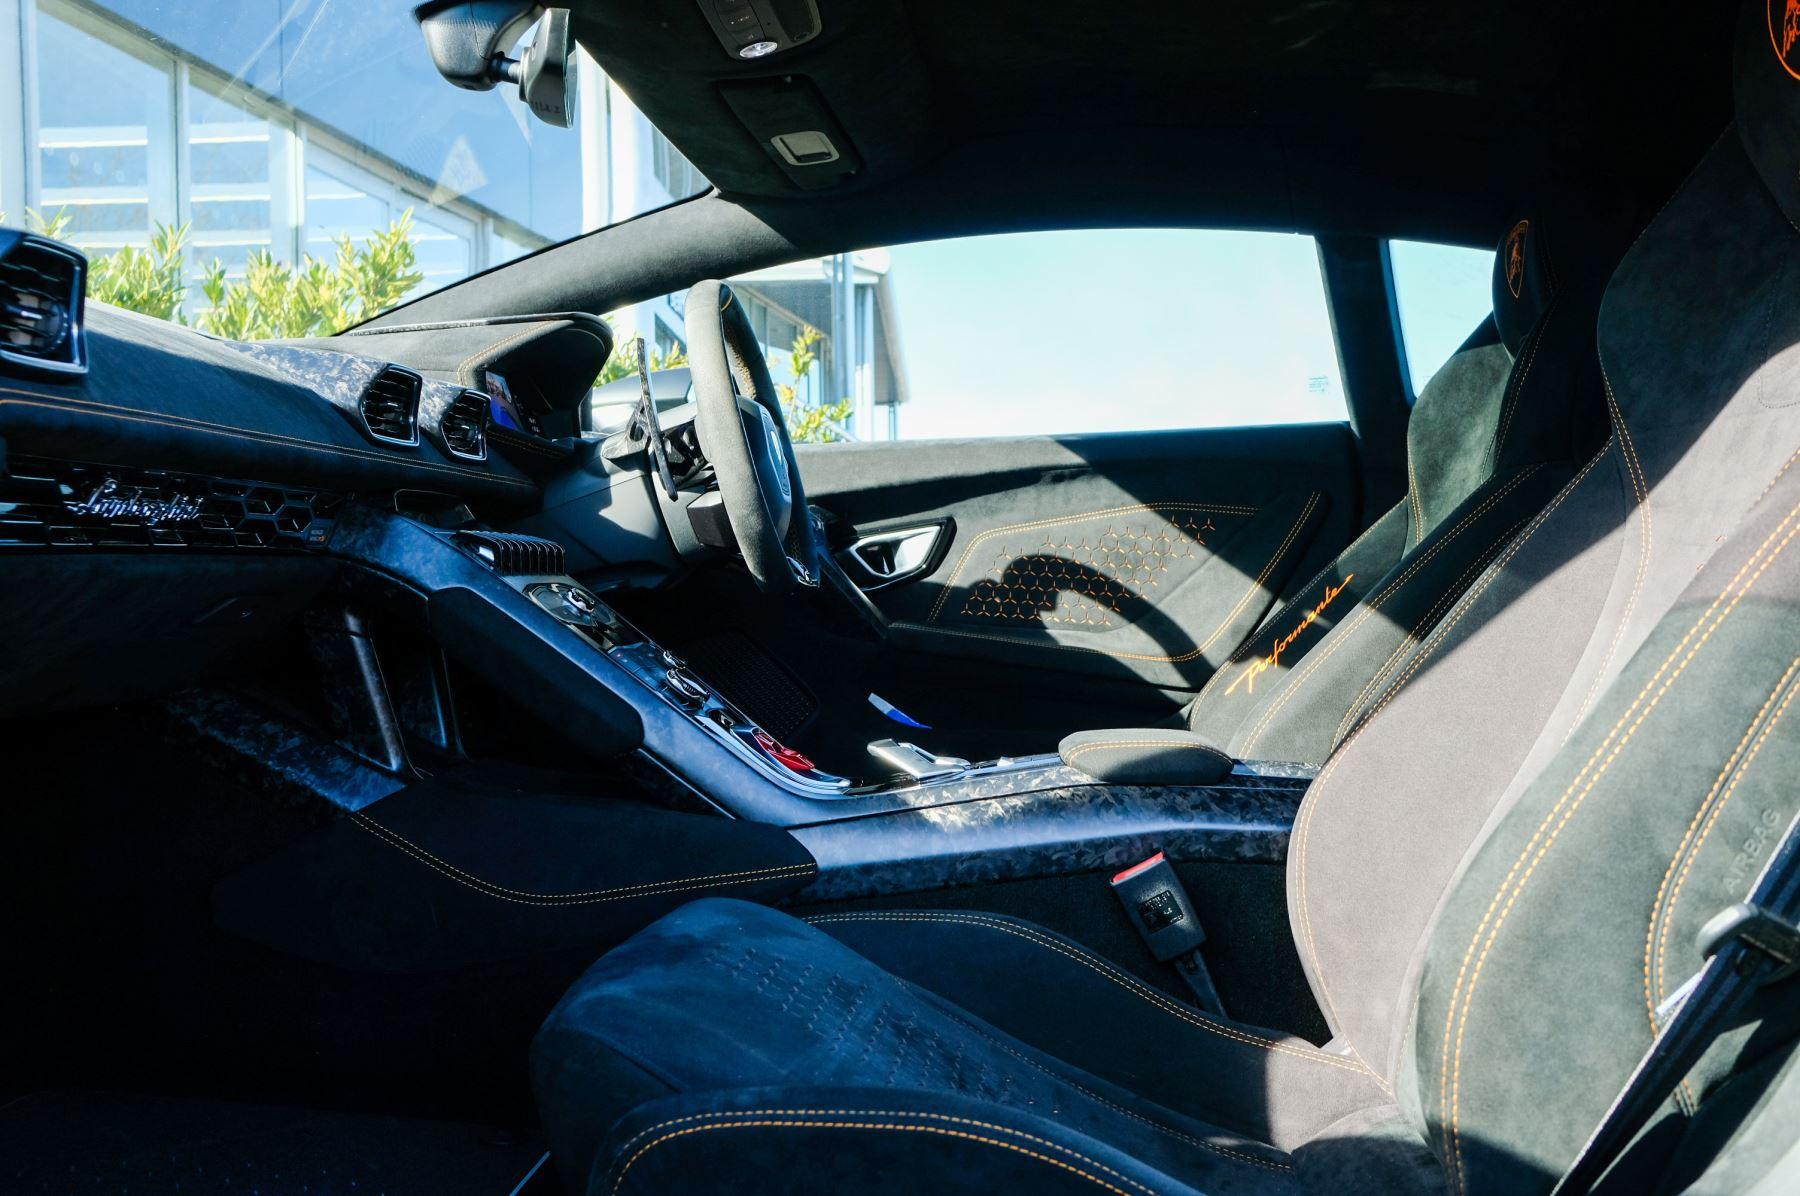 Lamborghini Huracan Performante LP 640-4 2dr LDF - Carbon Ceramic Brakes - Carbon Fiber Features - Comfort Seats image 6